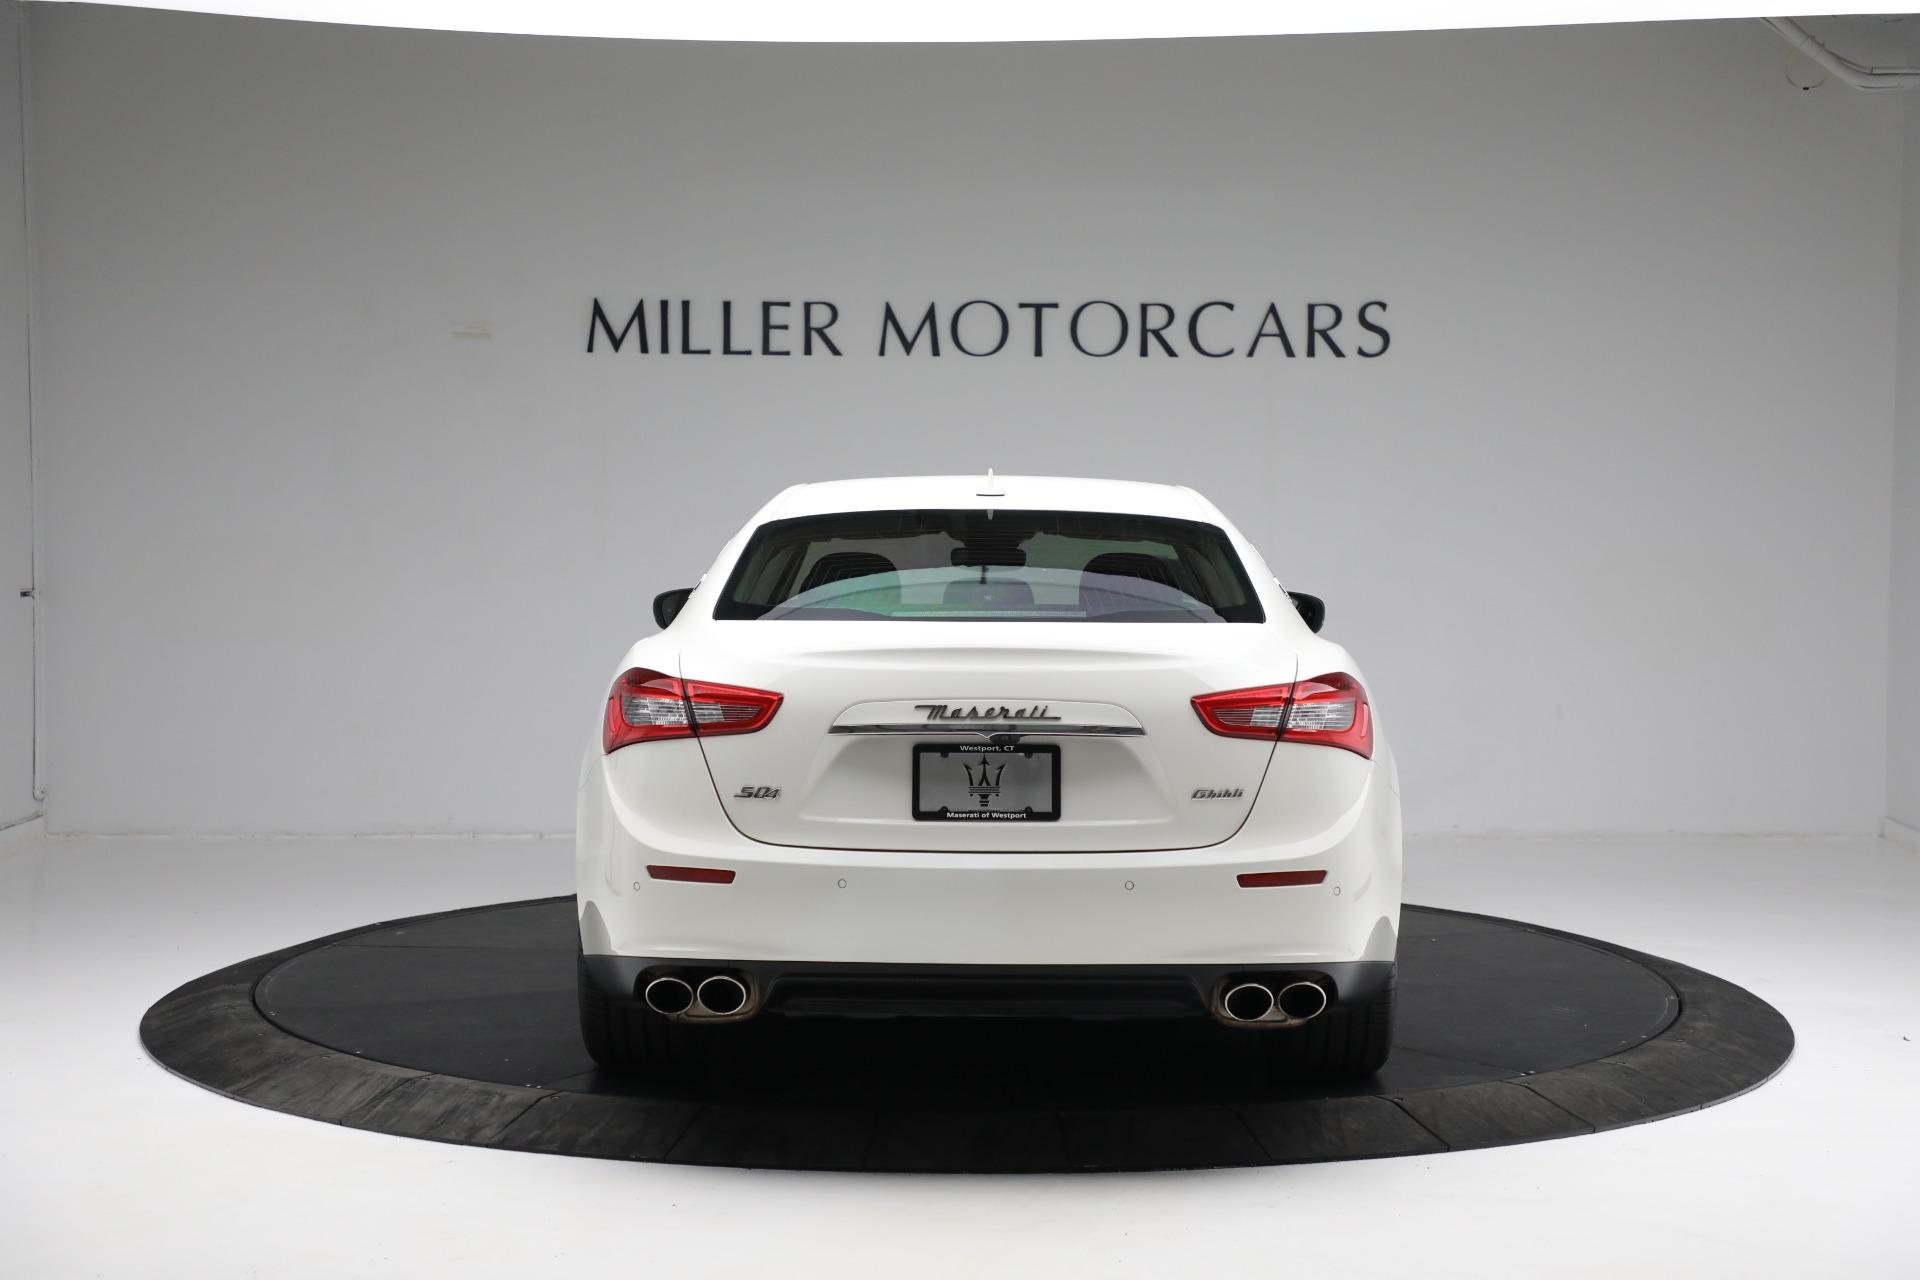 New 2017 Maserati Ghibli S Q4 EX-Loaner For Sale In Greenwich, CT 1019_p6